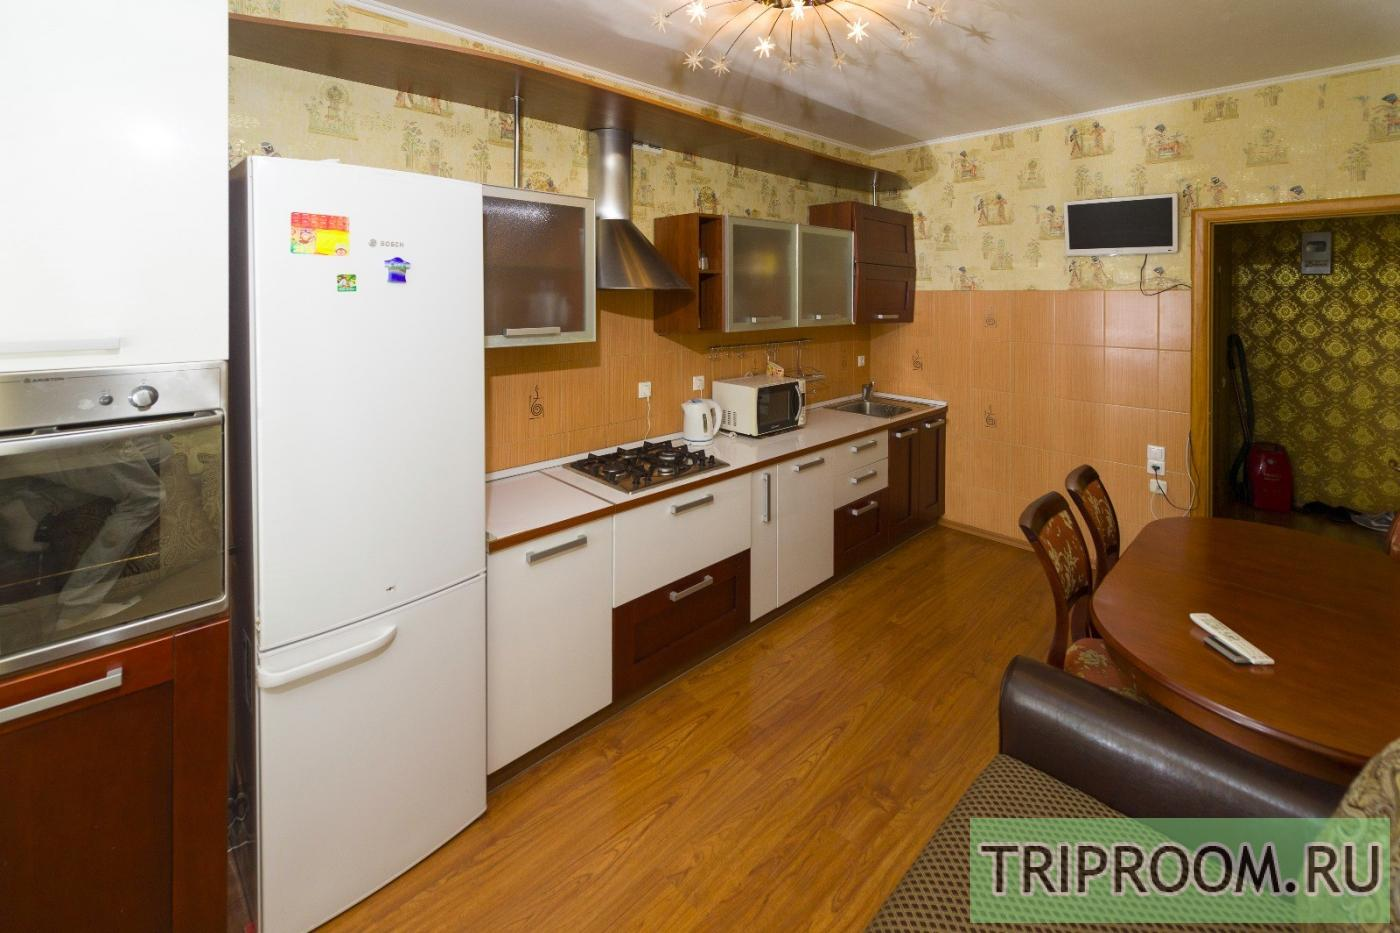 2-комнатная квартира посуточно (вариант № 2850), ул. Габдуллы Тукая улица, фото № 11